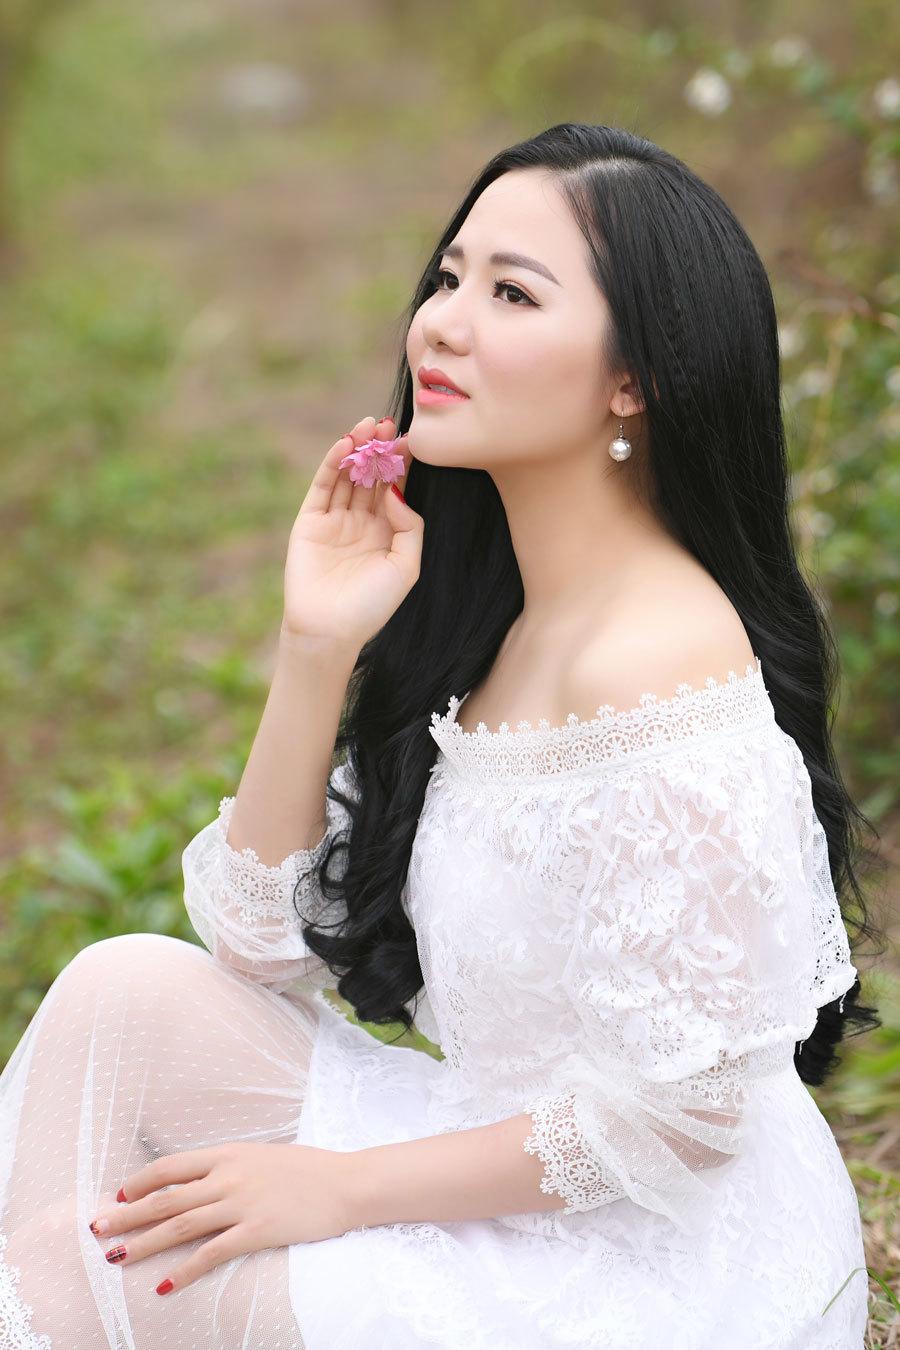 Phạm Thuỳ Dung